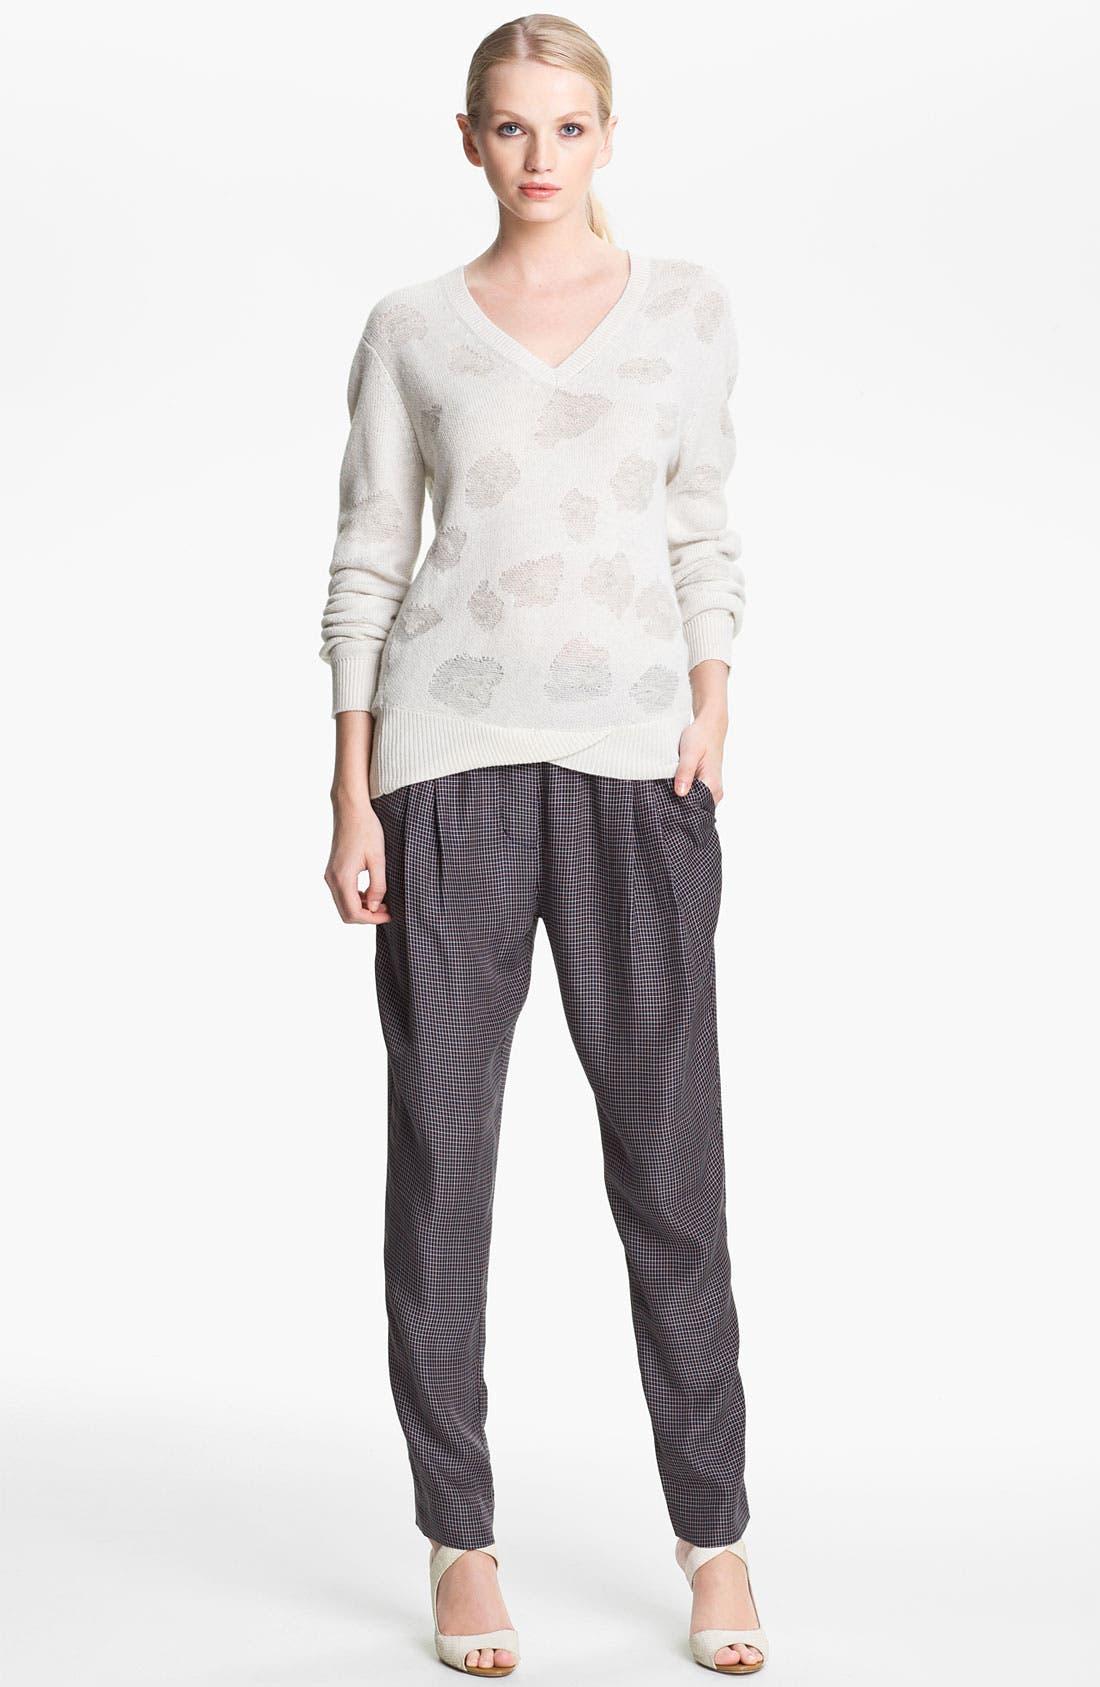 Main Image - 3.1 Phillip Lim Floral Jacquard Sweater